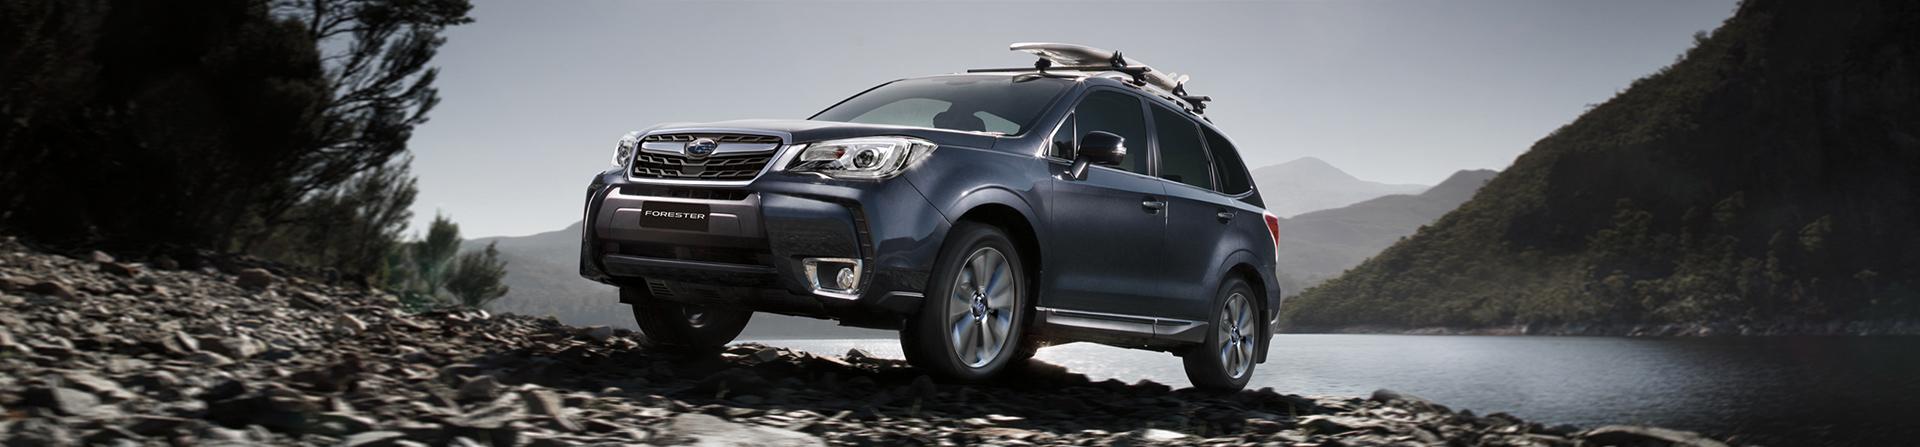 Subaru Forester Image 0